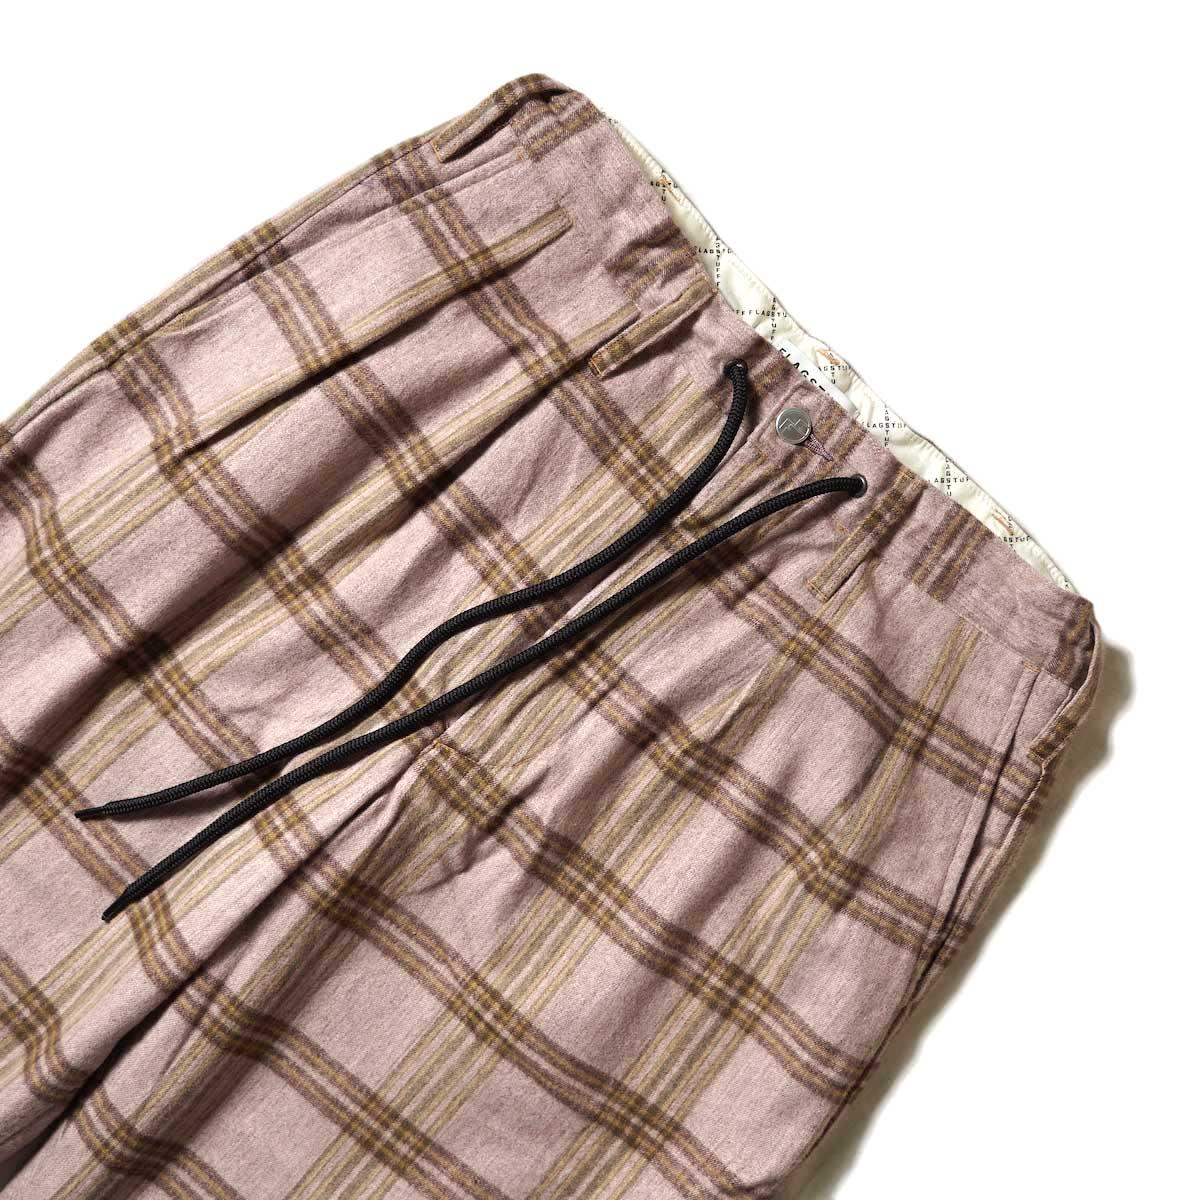 F-LAGSTUF-F / FORWARD PLEATS PANTS (ORIGINAL CHECK / PURPLE)ウエスト